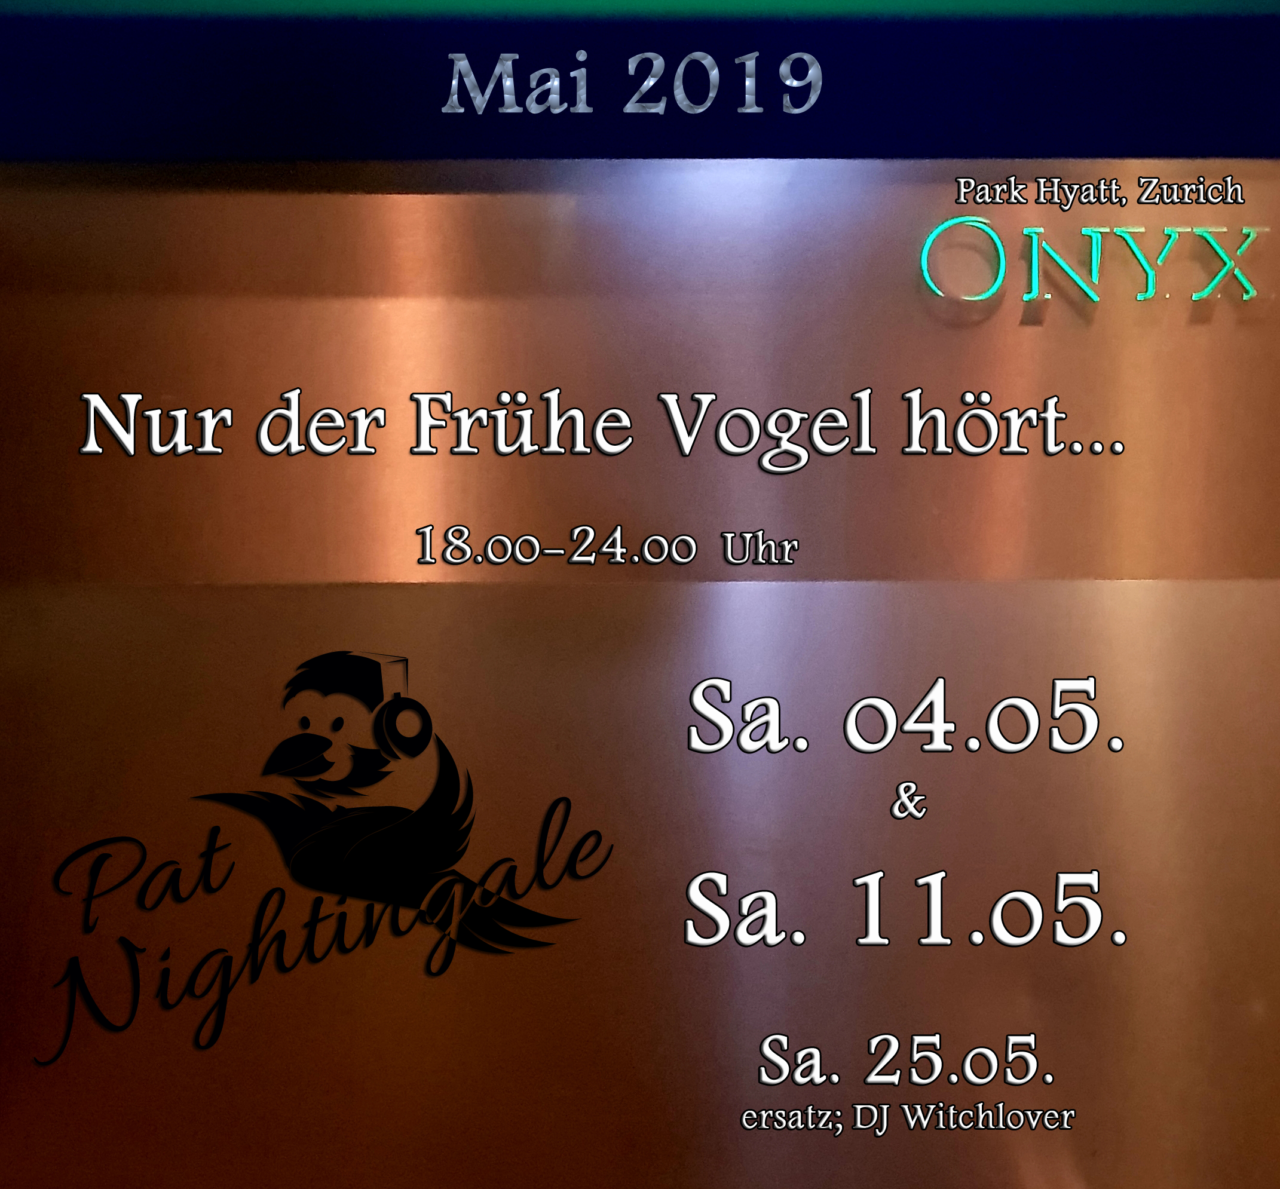 ONYX Flyer Mai 19